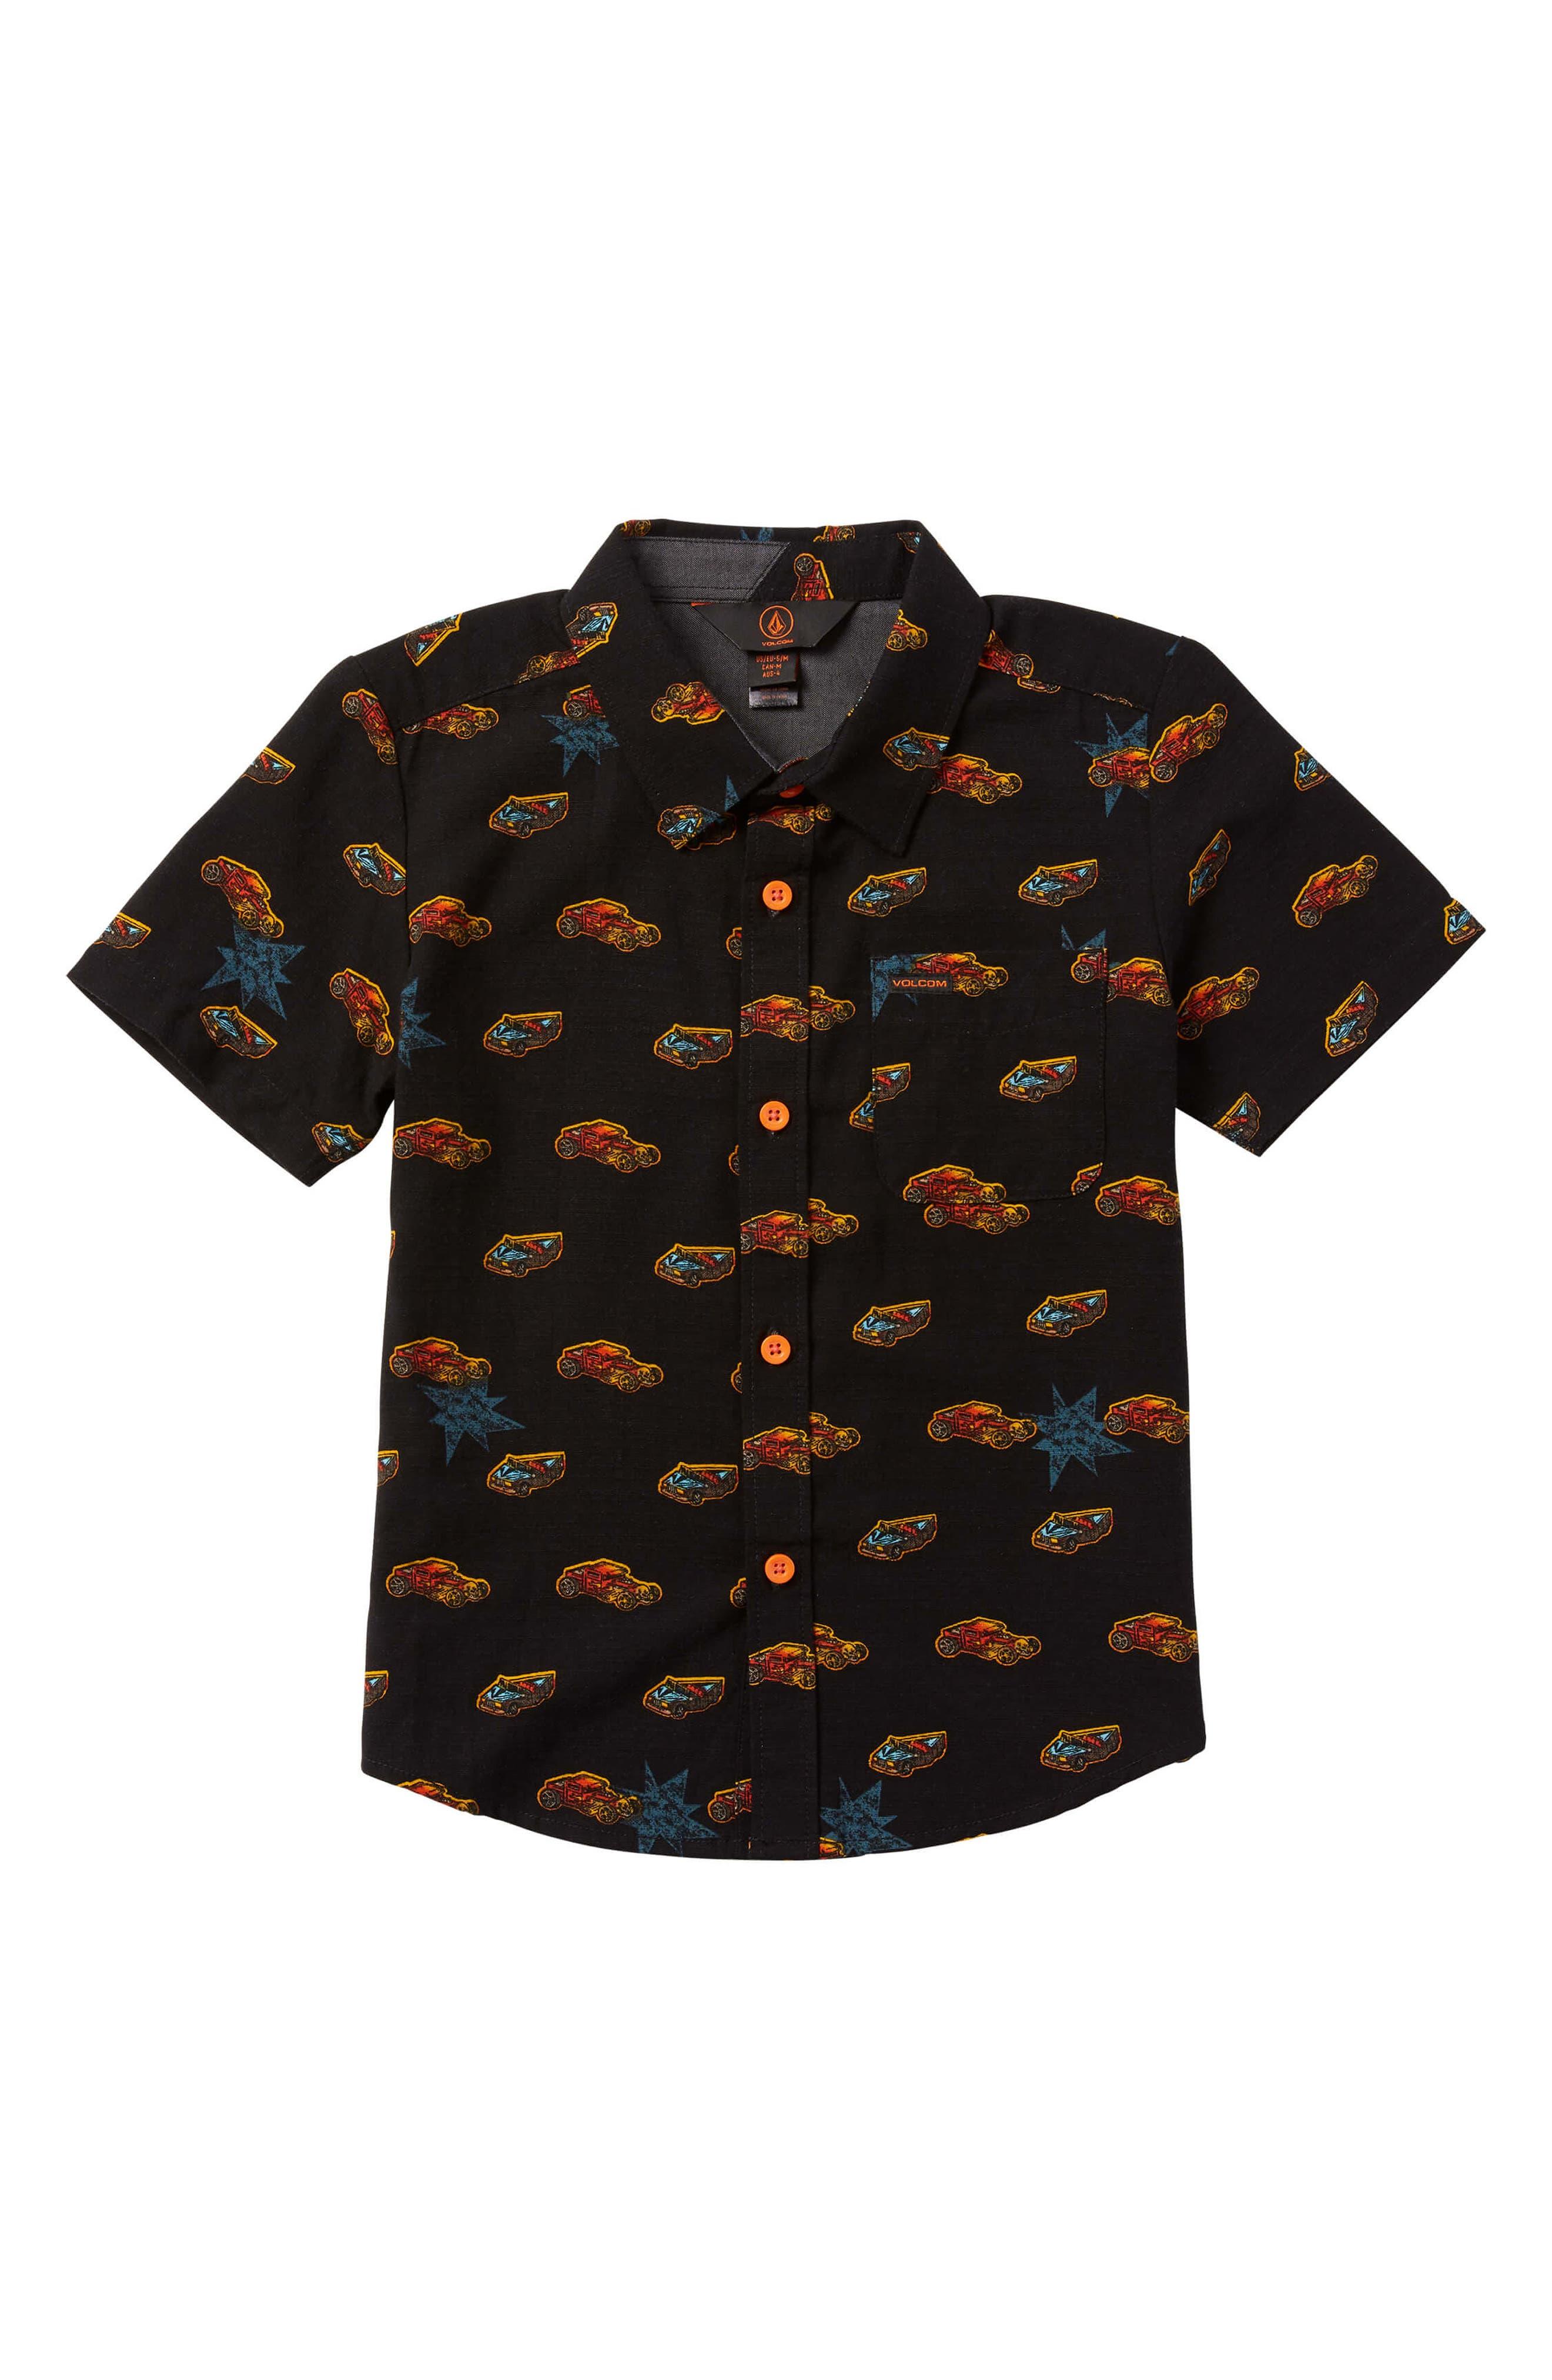 VOLCOM,                             x Hot Wheels<sup>®</sup> Woven Shirt,                             Main thumbnail 1, color,                             001